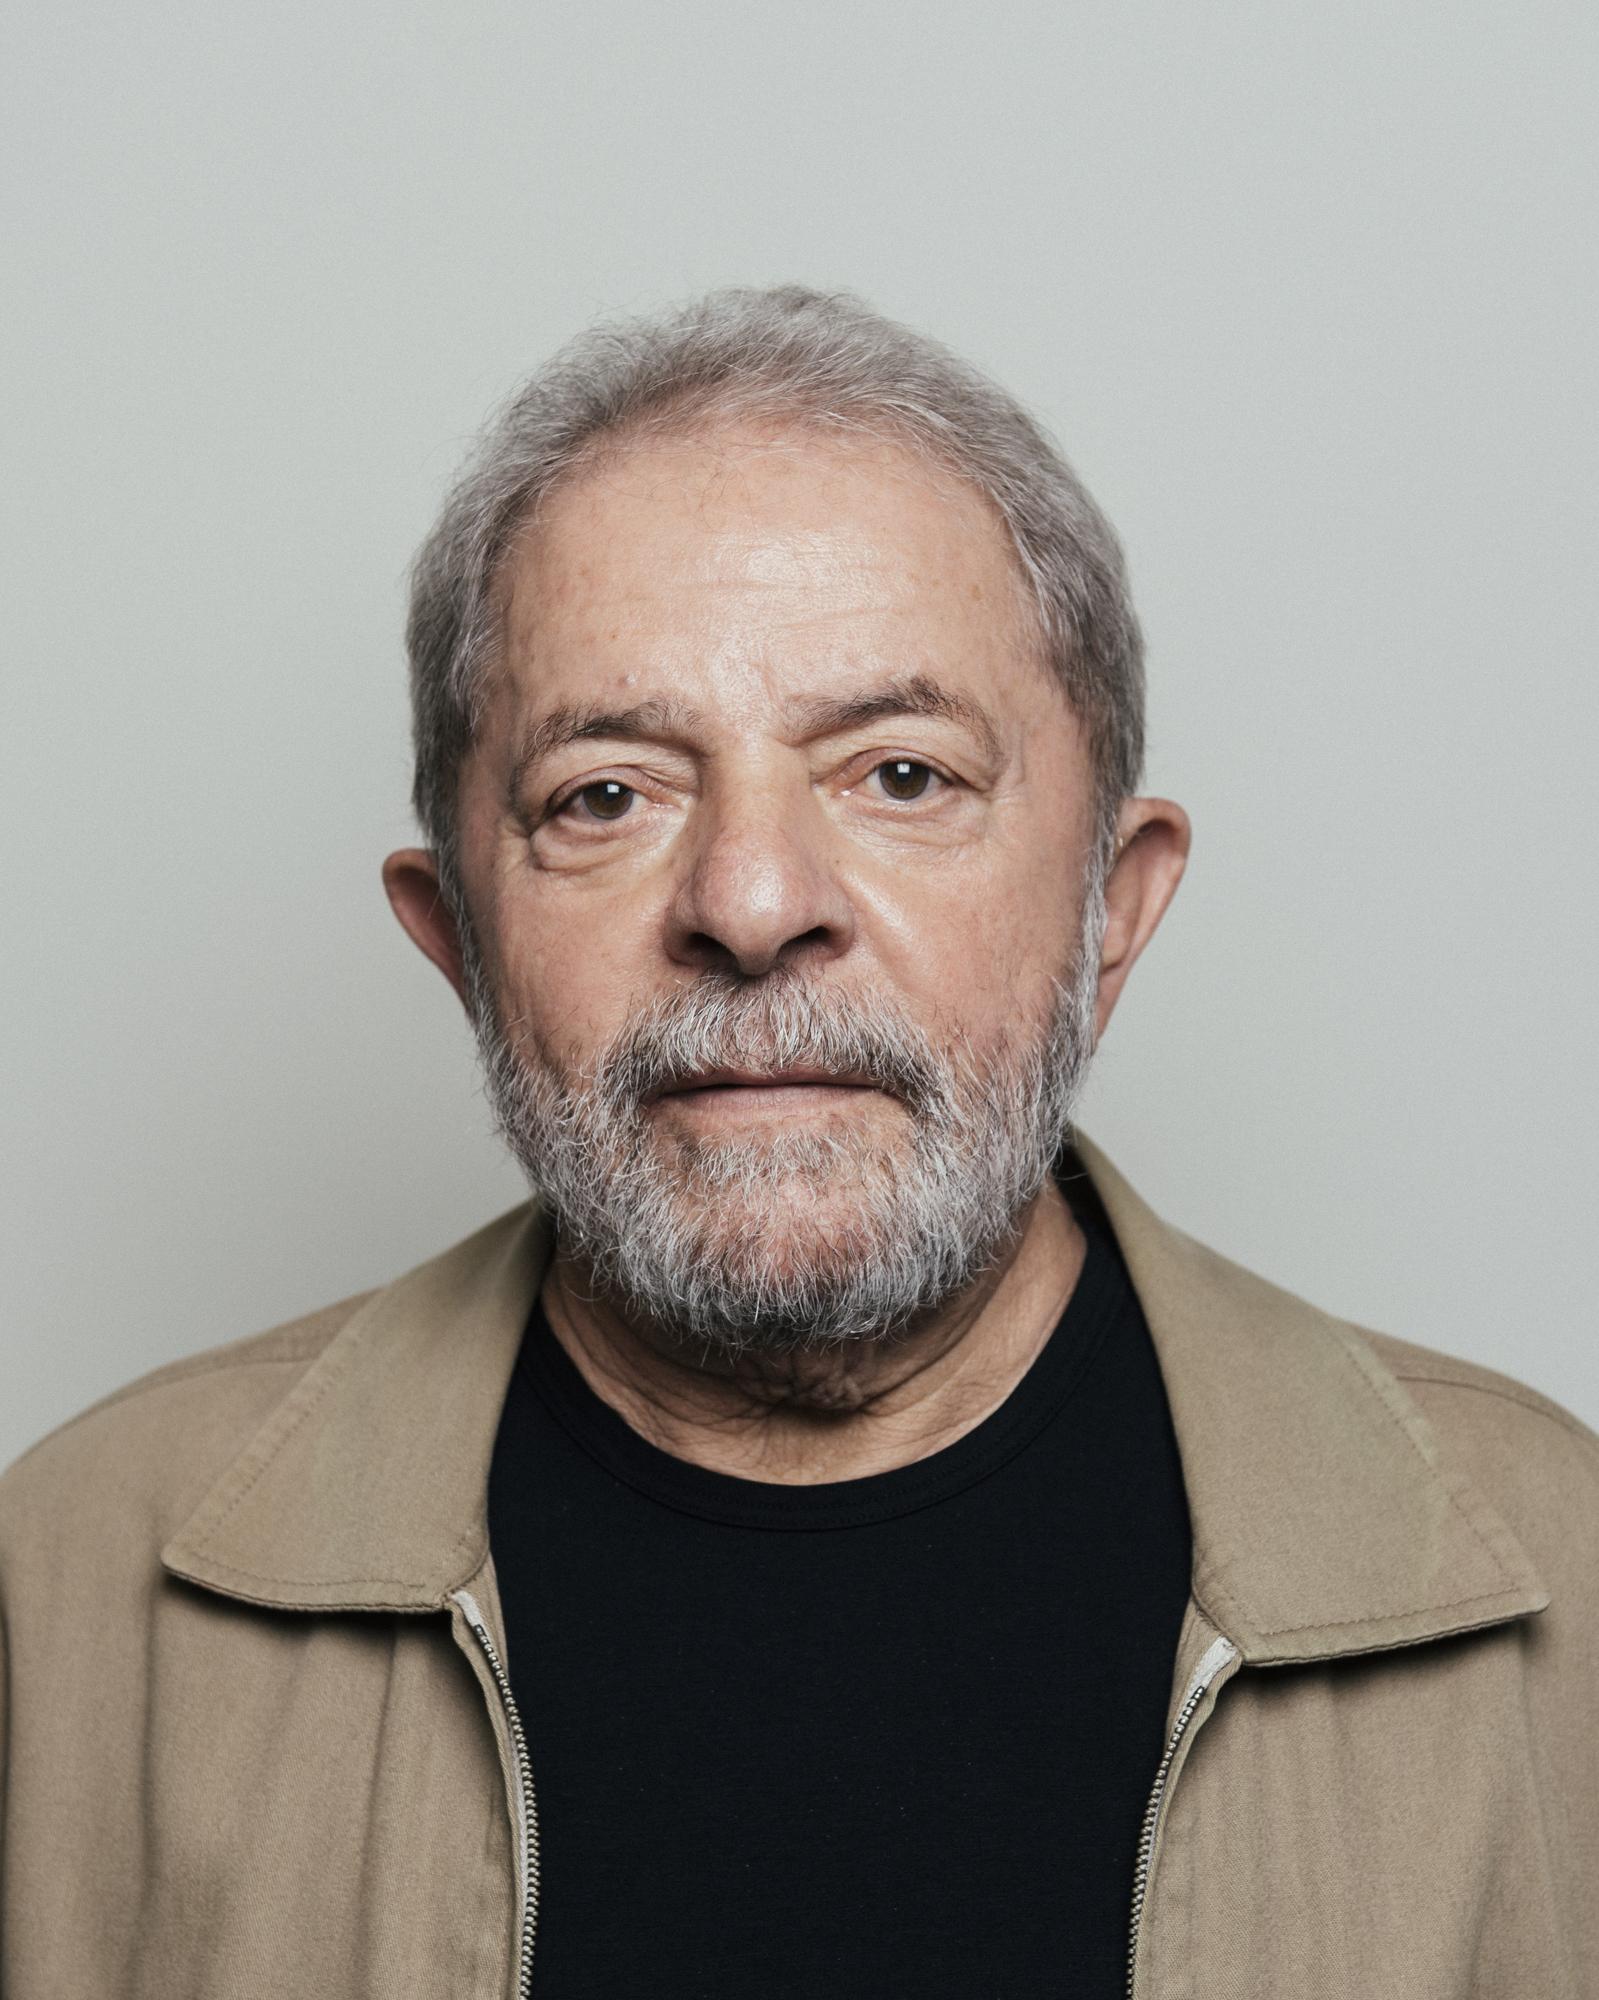 Luiz Inácio Lula da Silva, ex-presidente do Brasil, São Paulo, 2016.